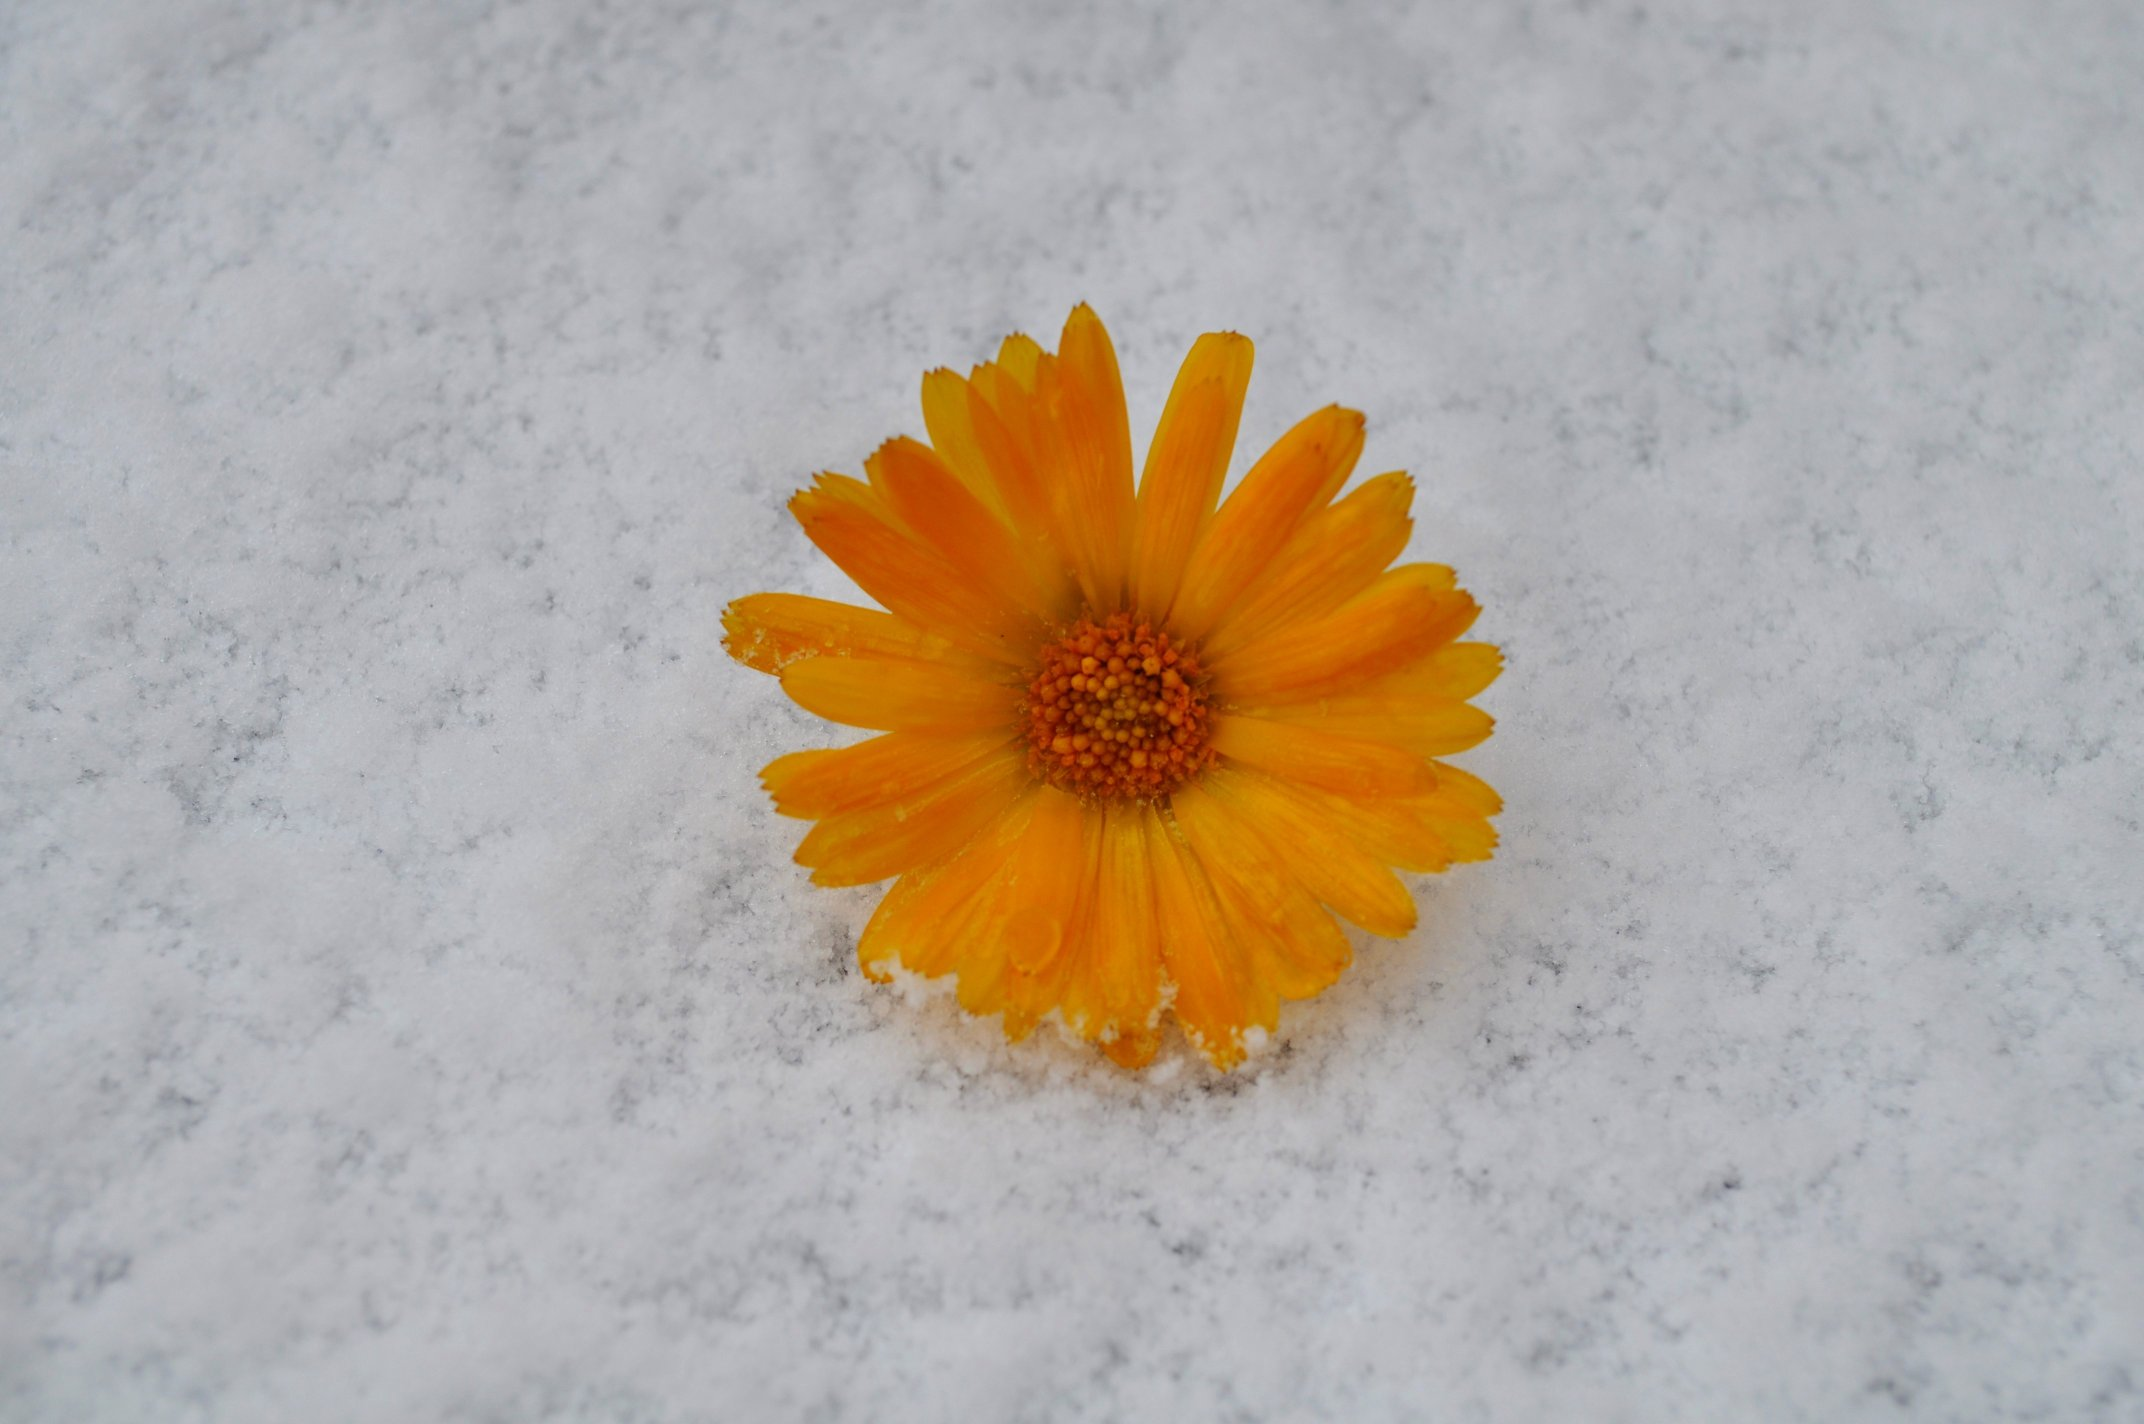 Snow Flower by Forestina Fotos on DeviantArt